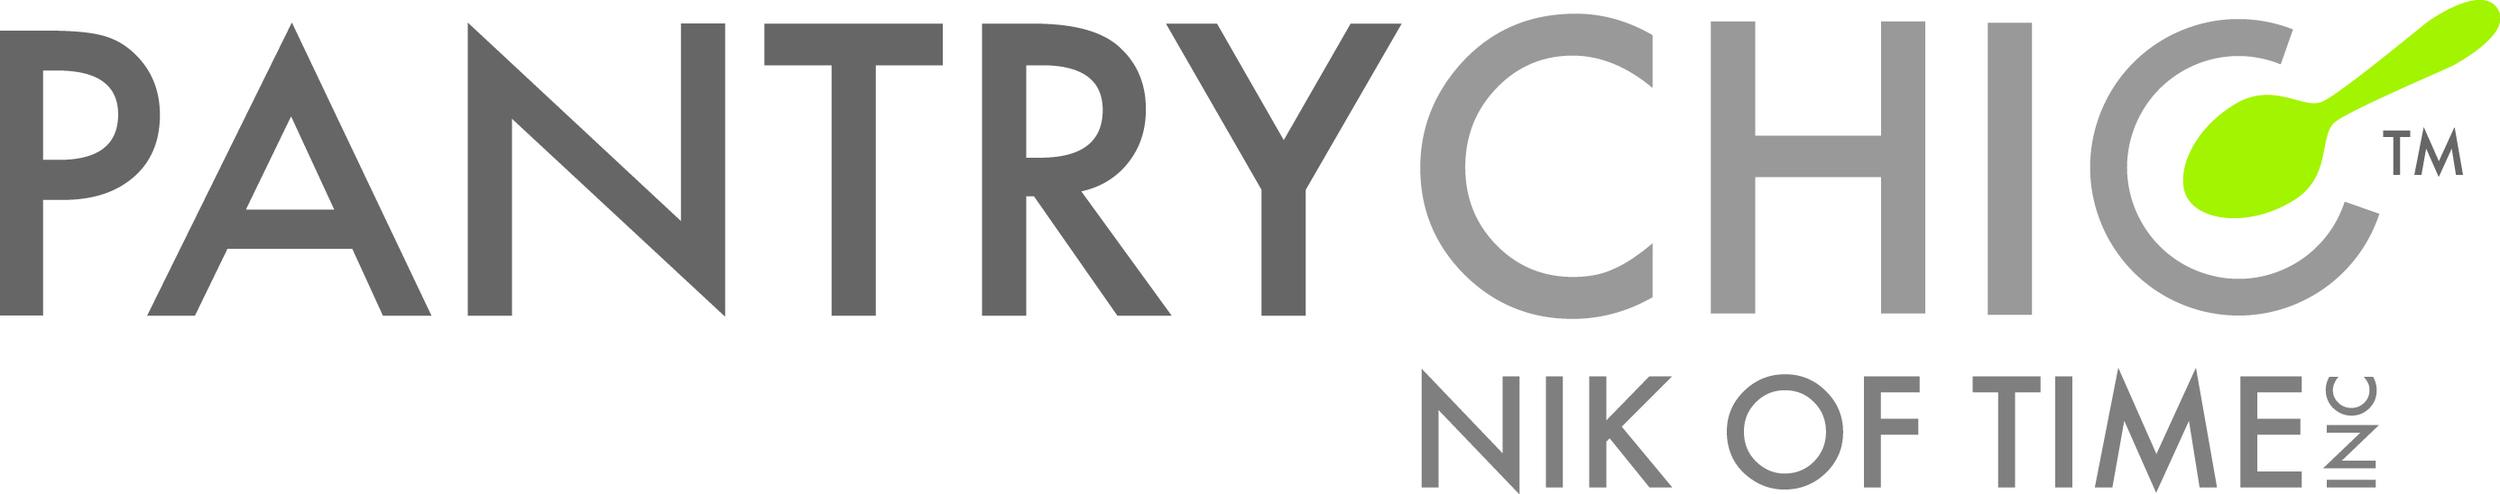 PANTRYCHIC logo - TM.jpg